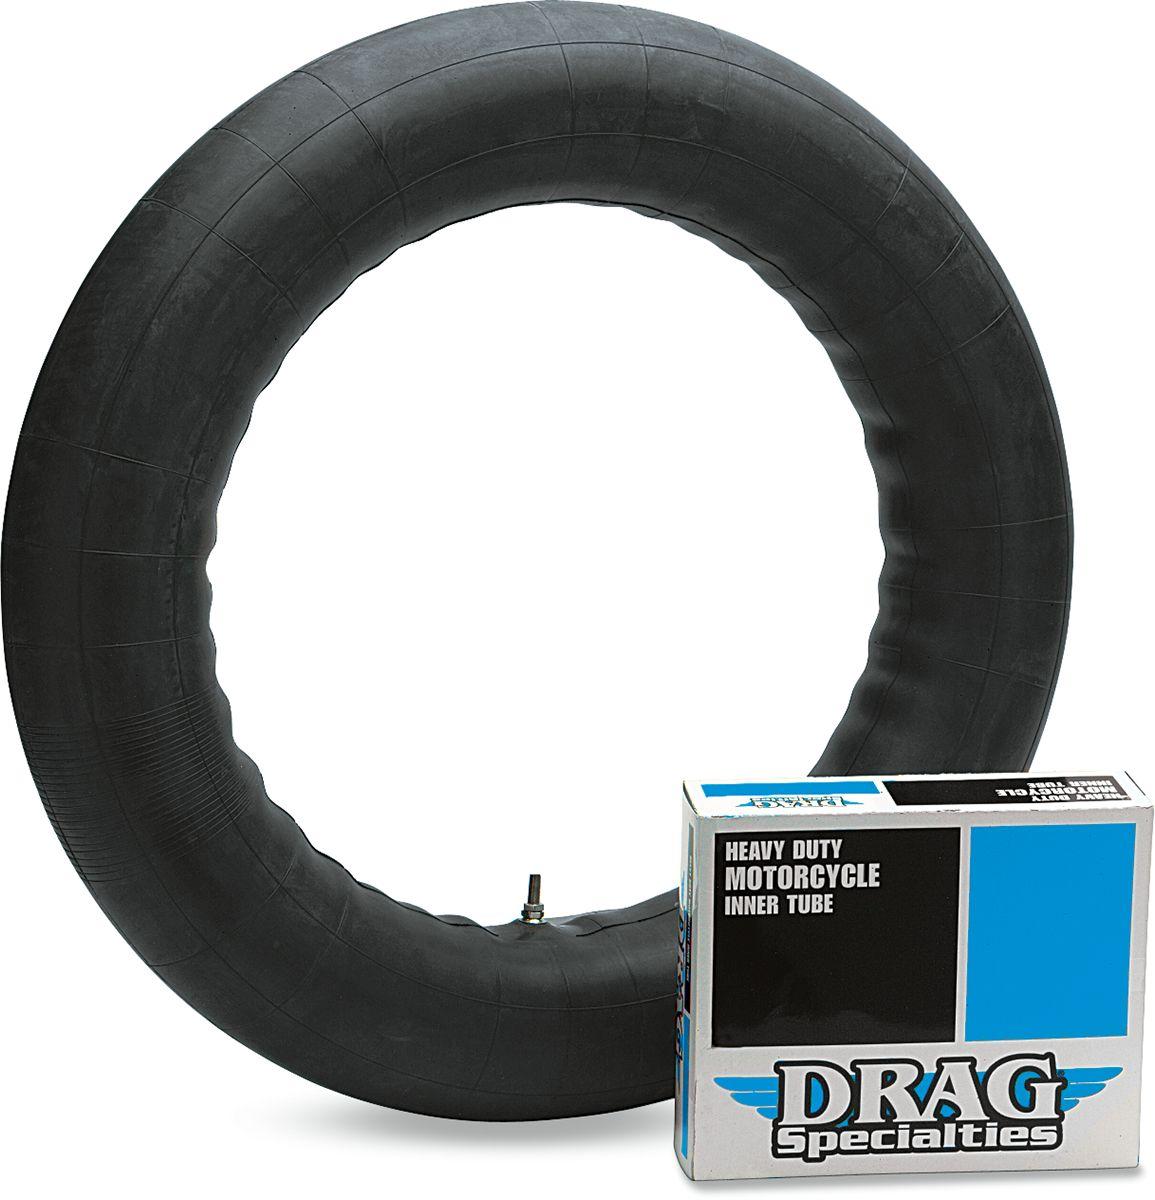 TUBE DRAG 130/90-16 SMV